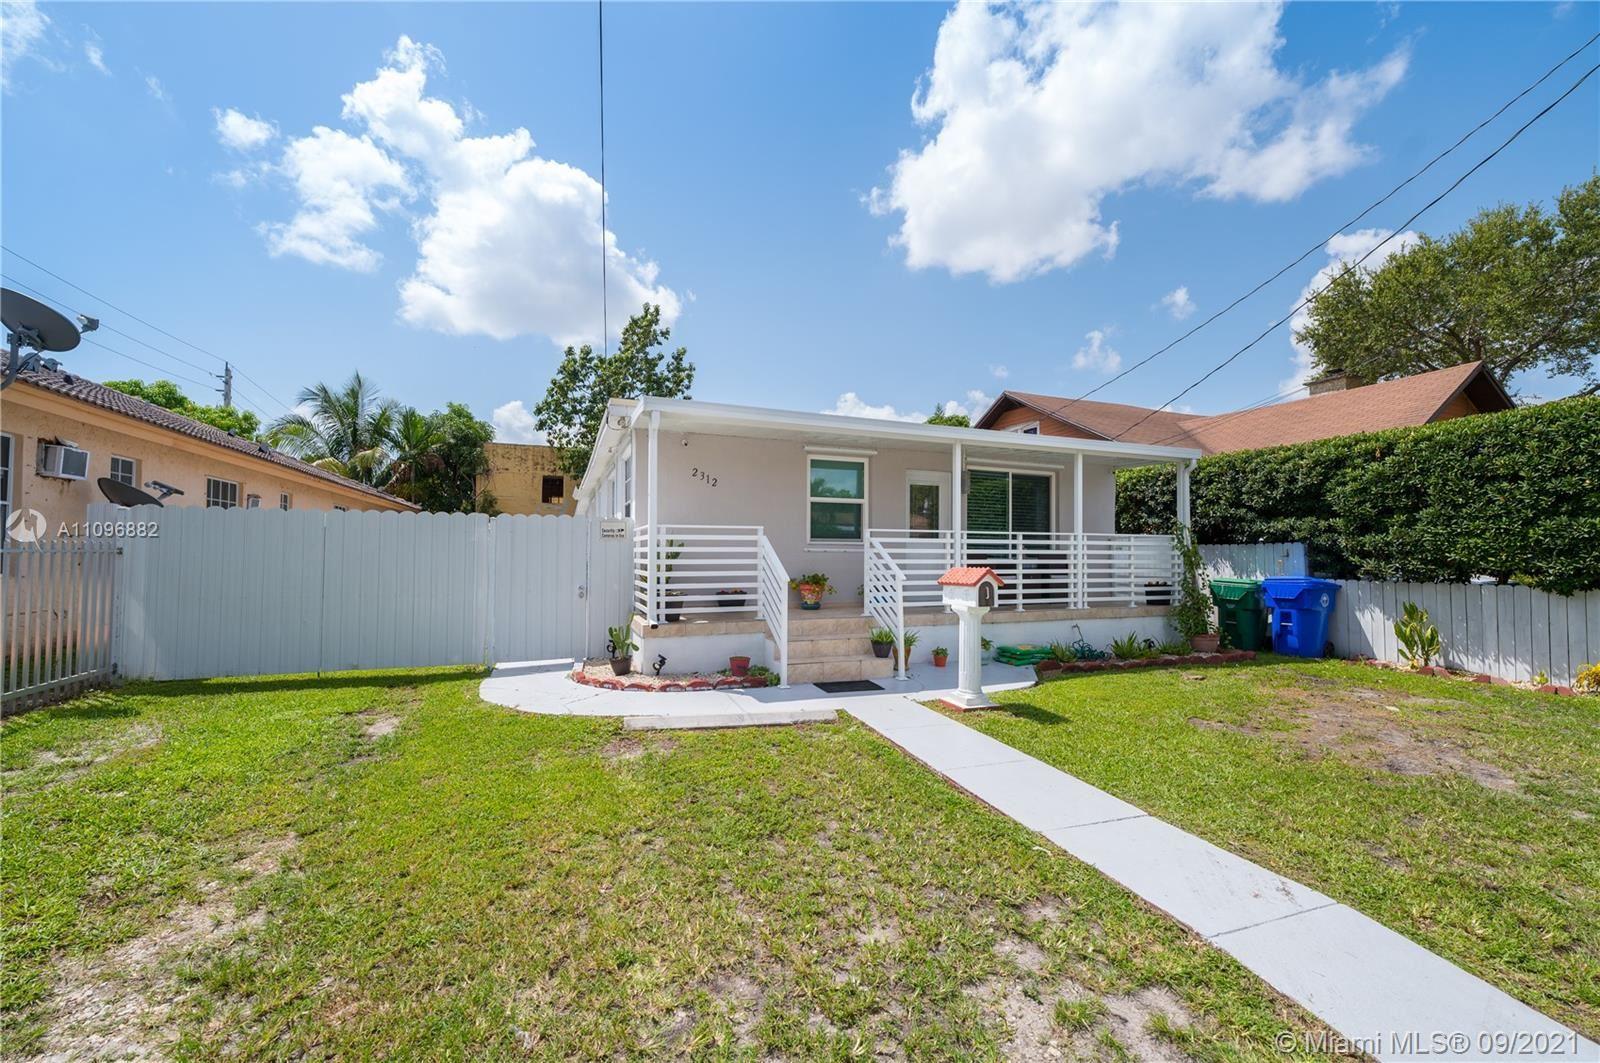 2312 NW 3rd St, Miami, FL 33125 - #: A11096882